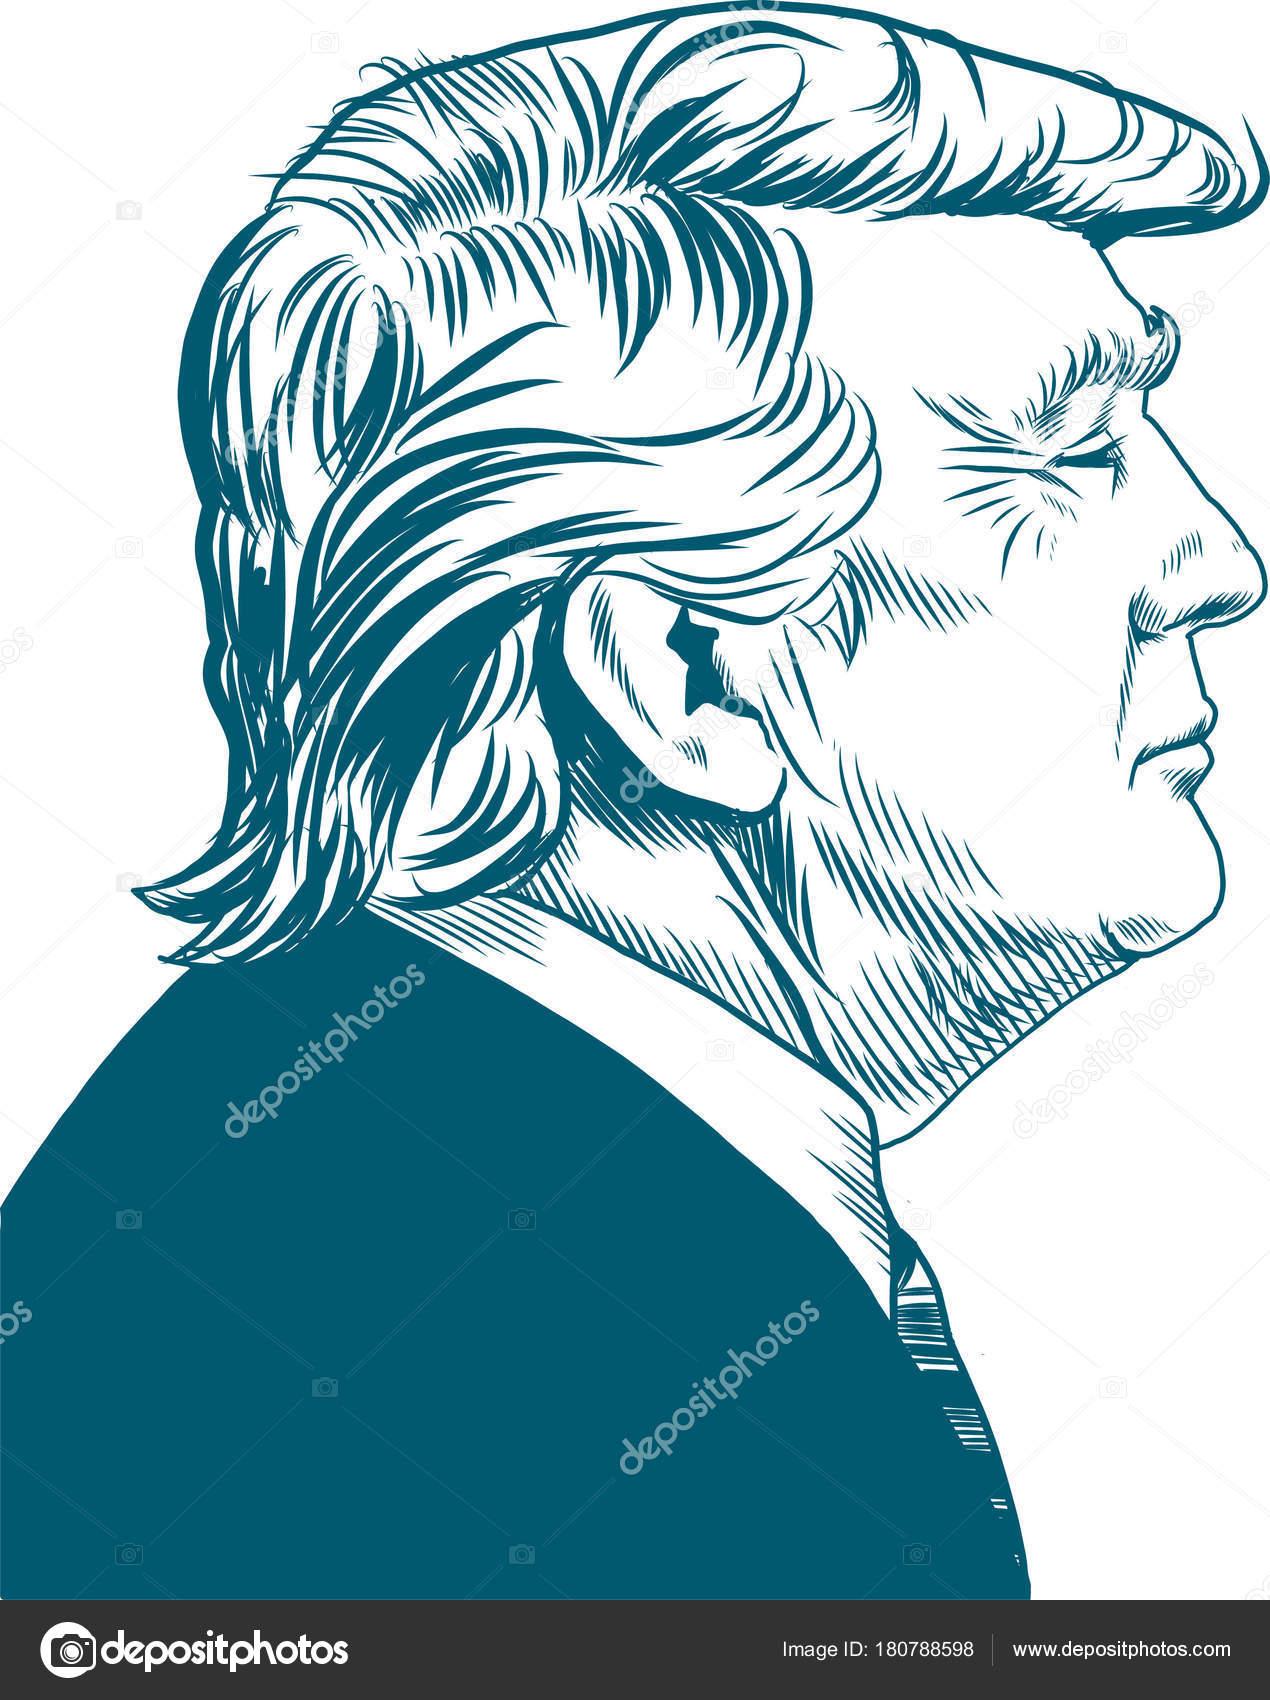 Donald Trump Vector Portrait Drawing Illustration January 2018